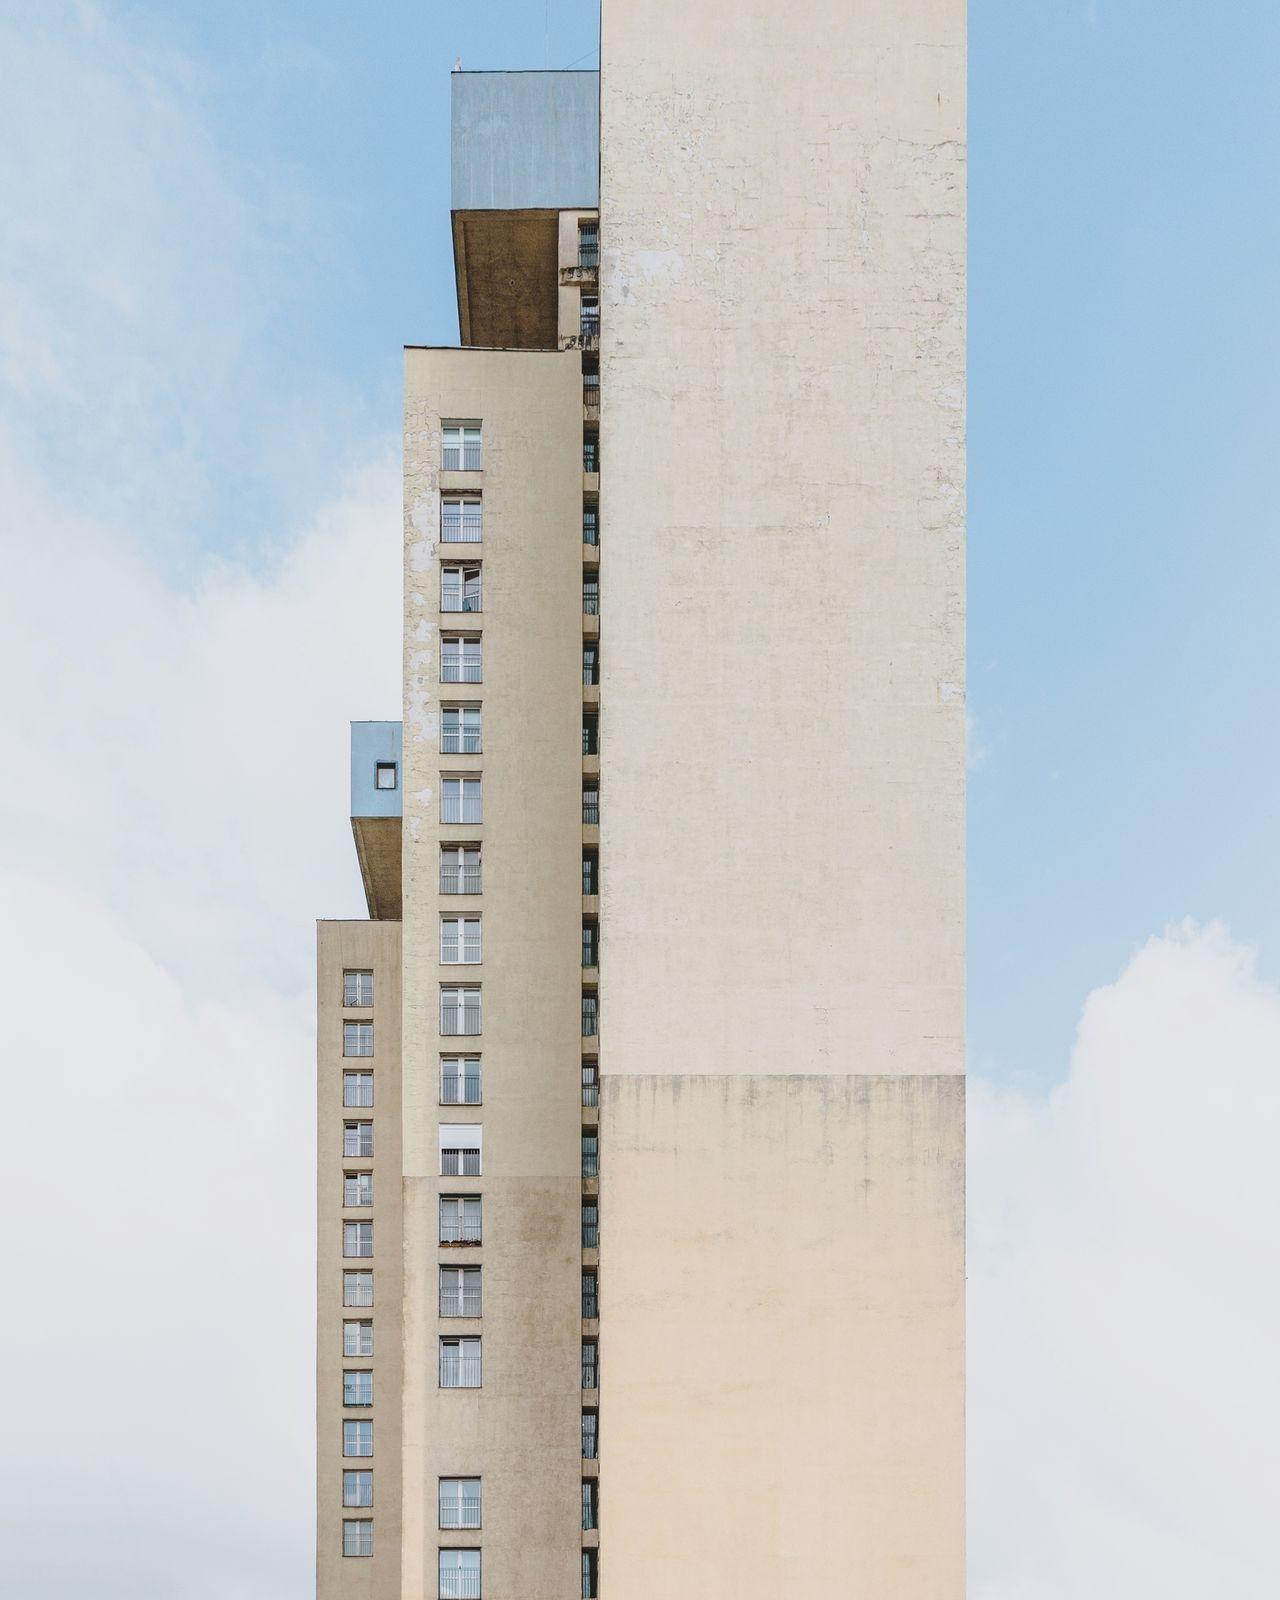 architecture, sky, built structure, building exterior, skyscraper